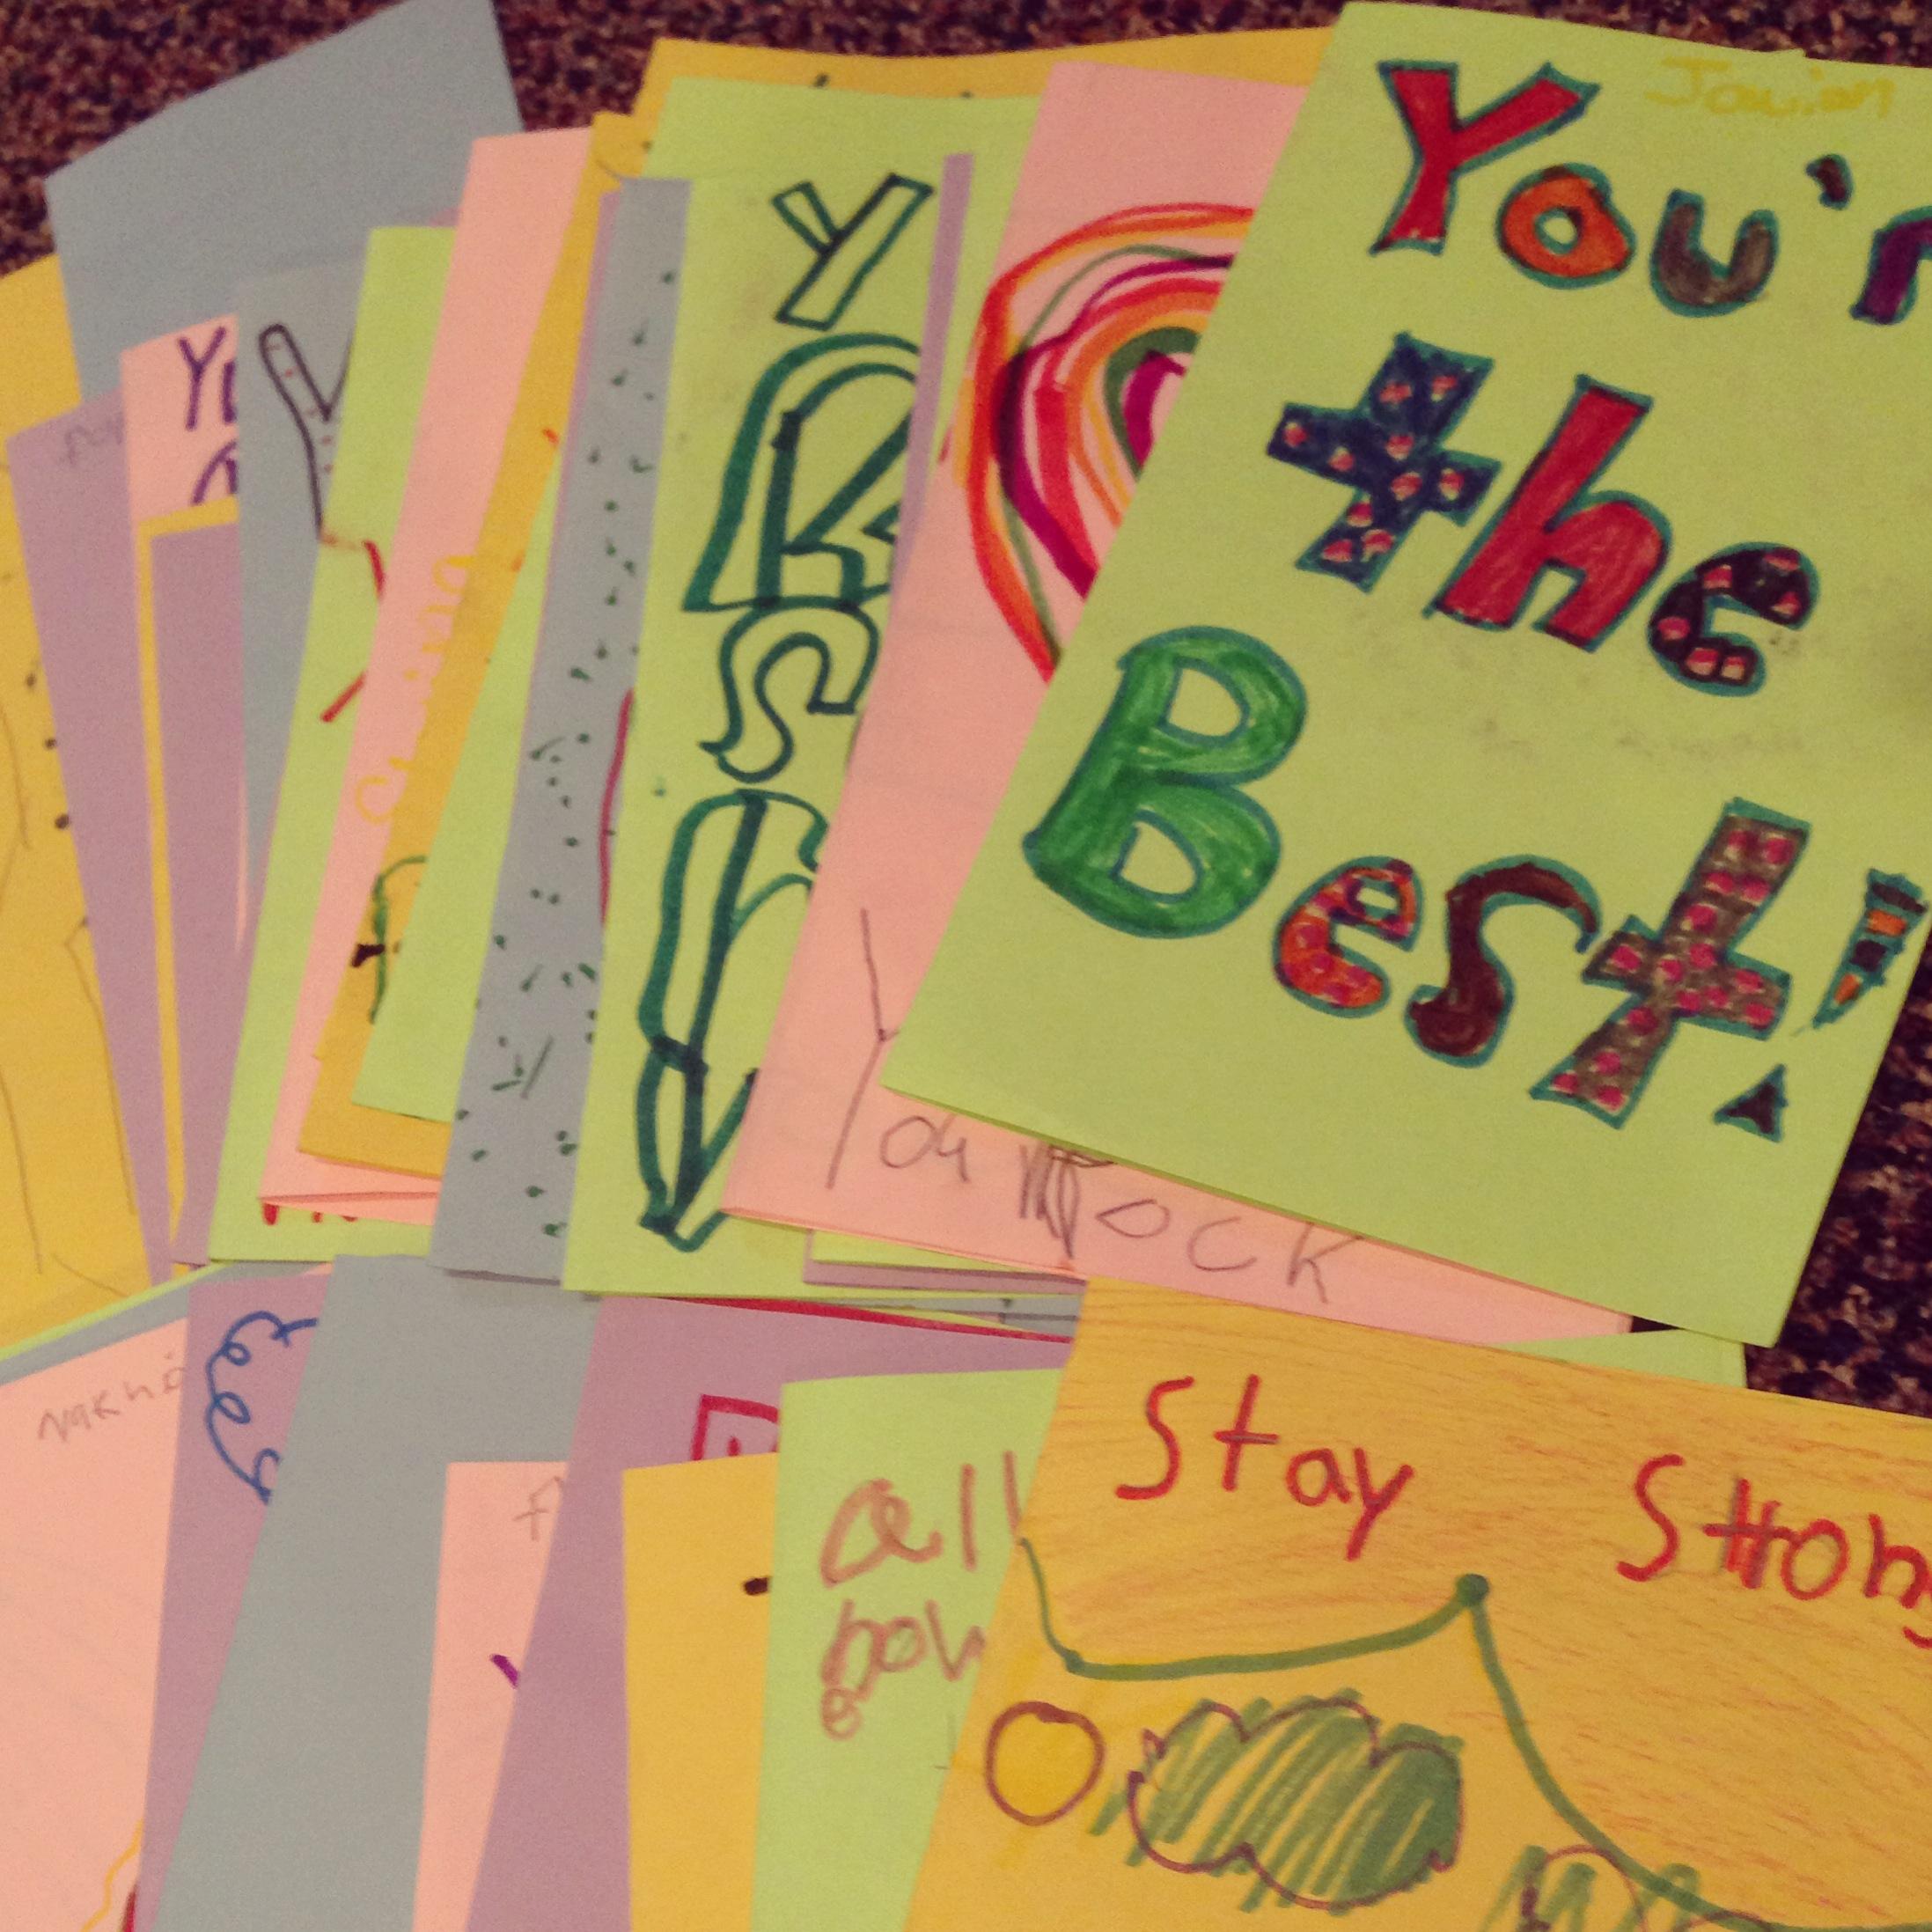 Encouragement Through A Card